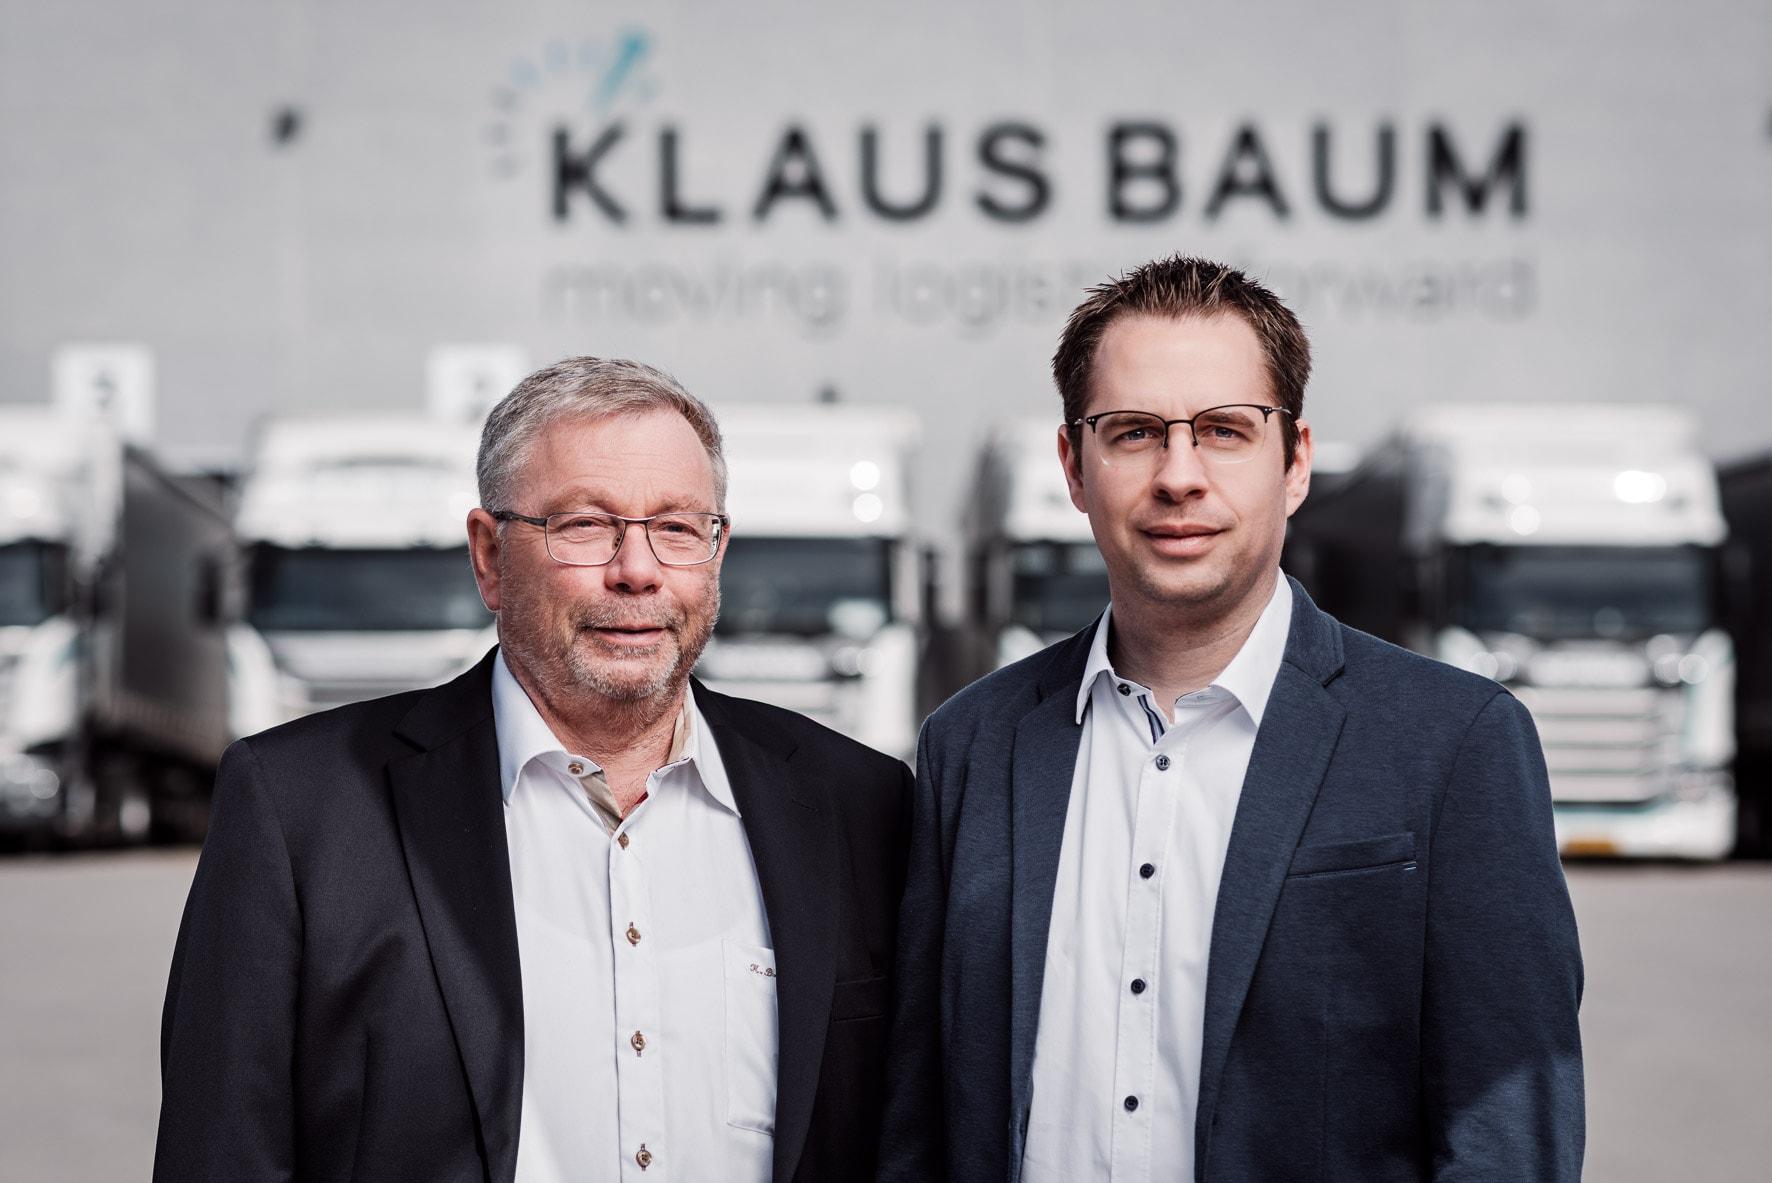 Klausbaum Transporte